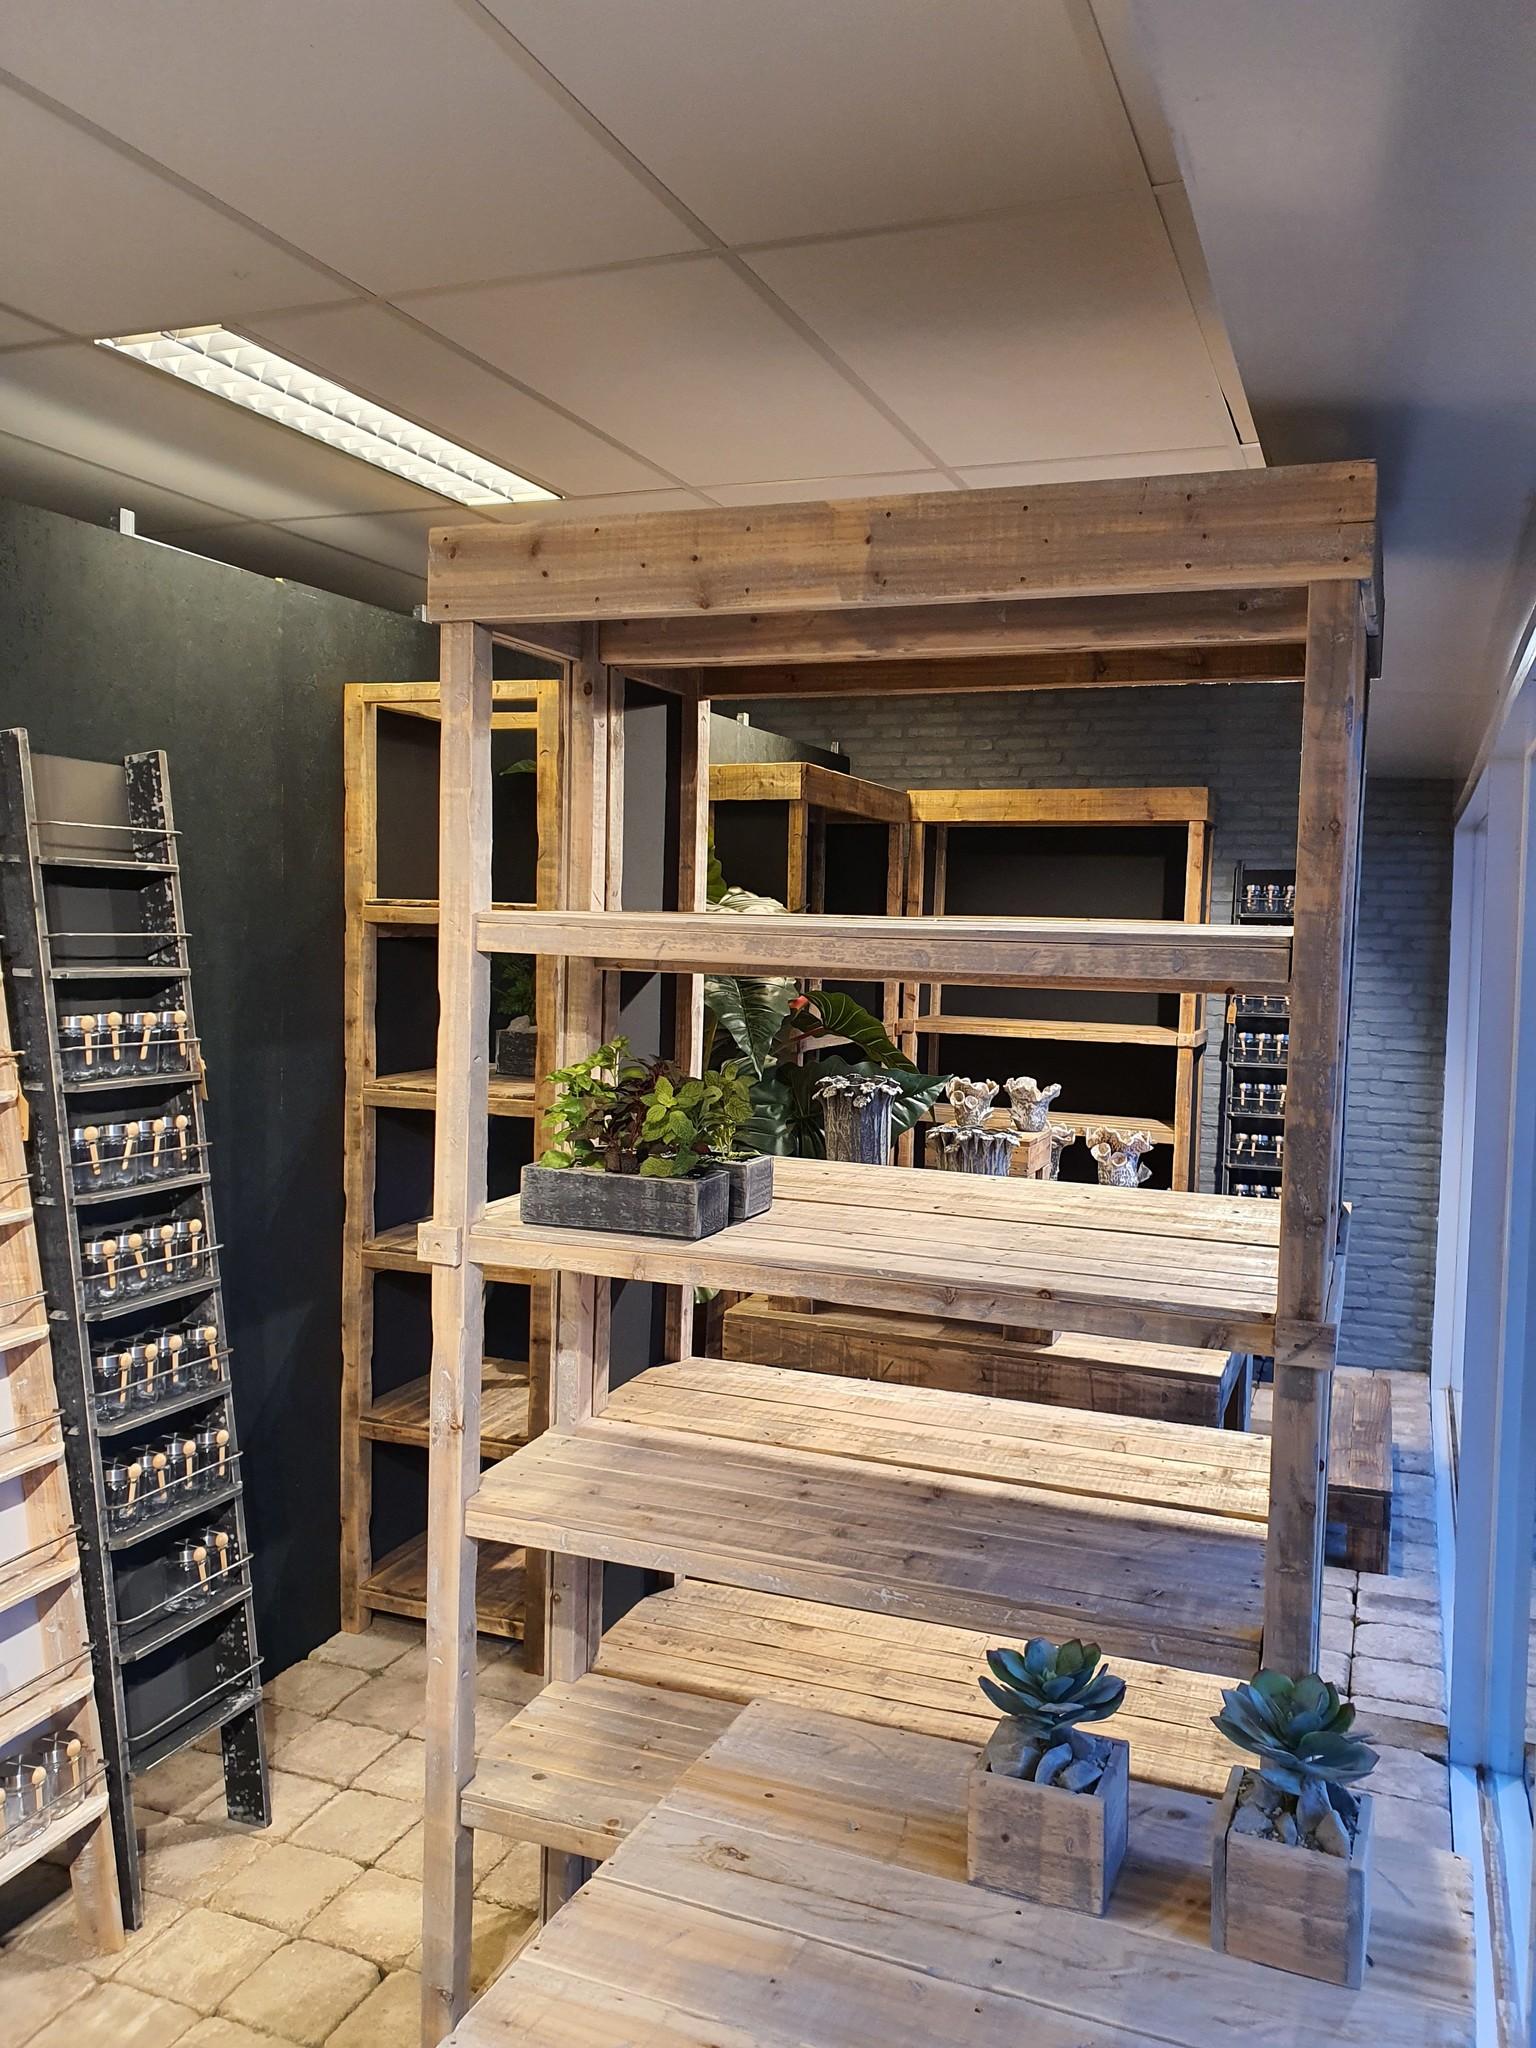 shop int old dutch cabinet C 220-3